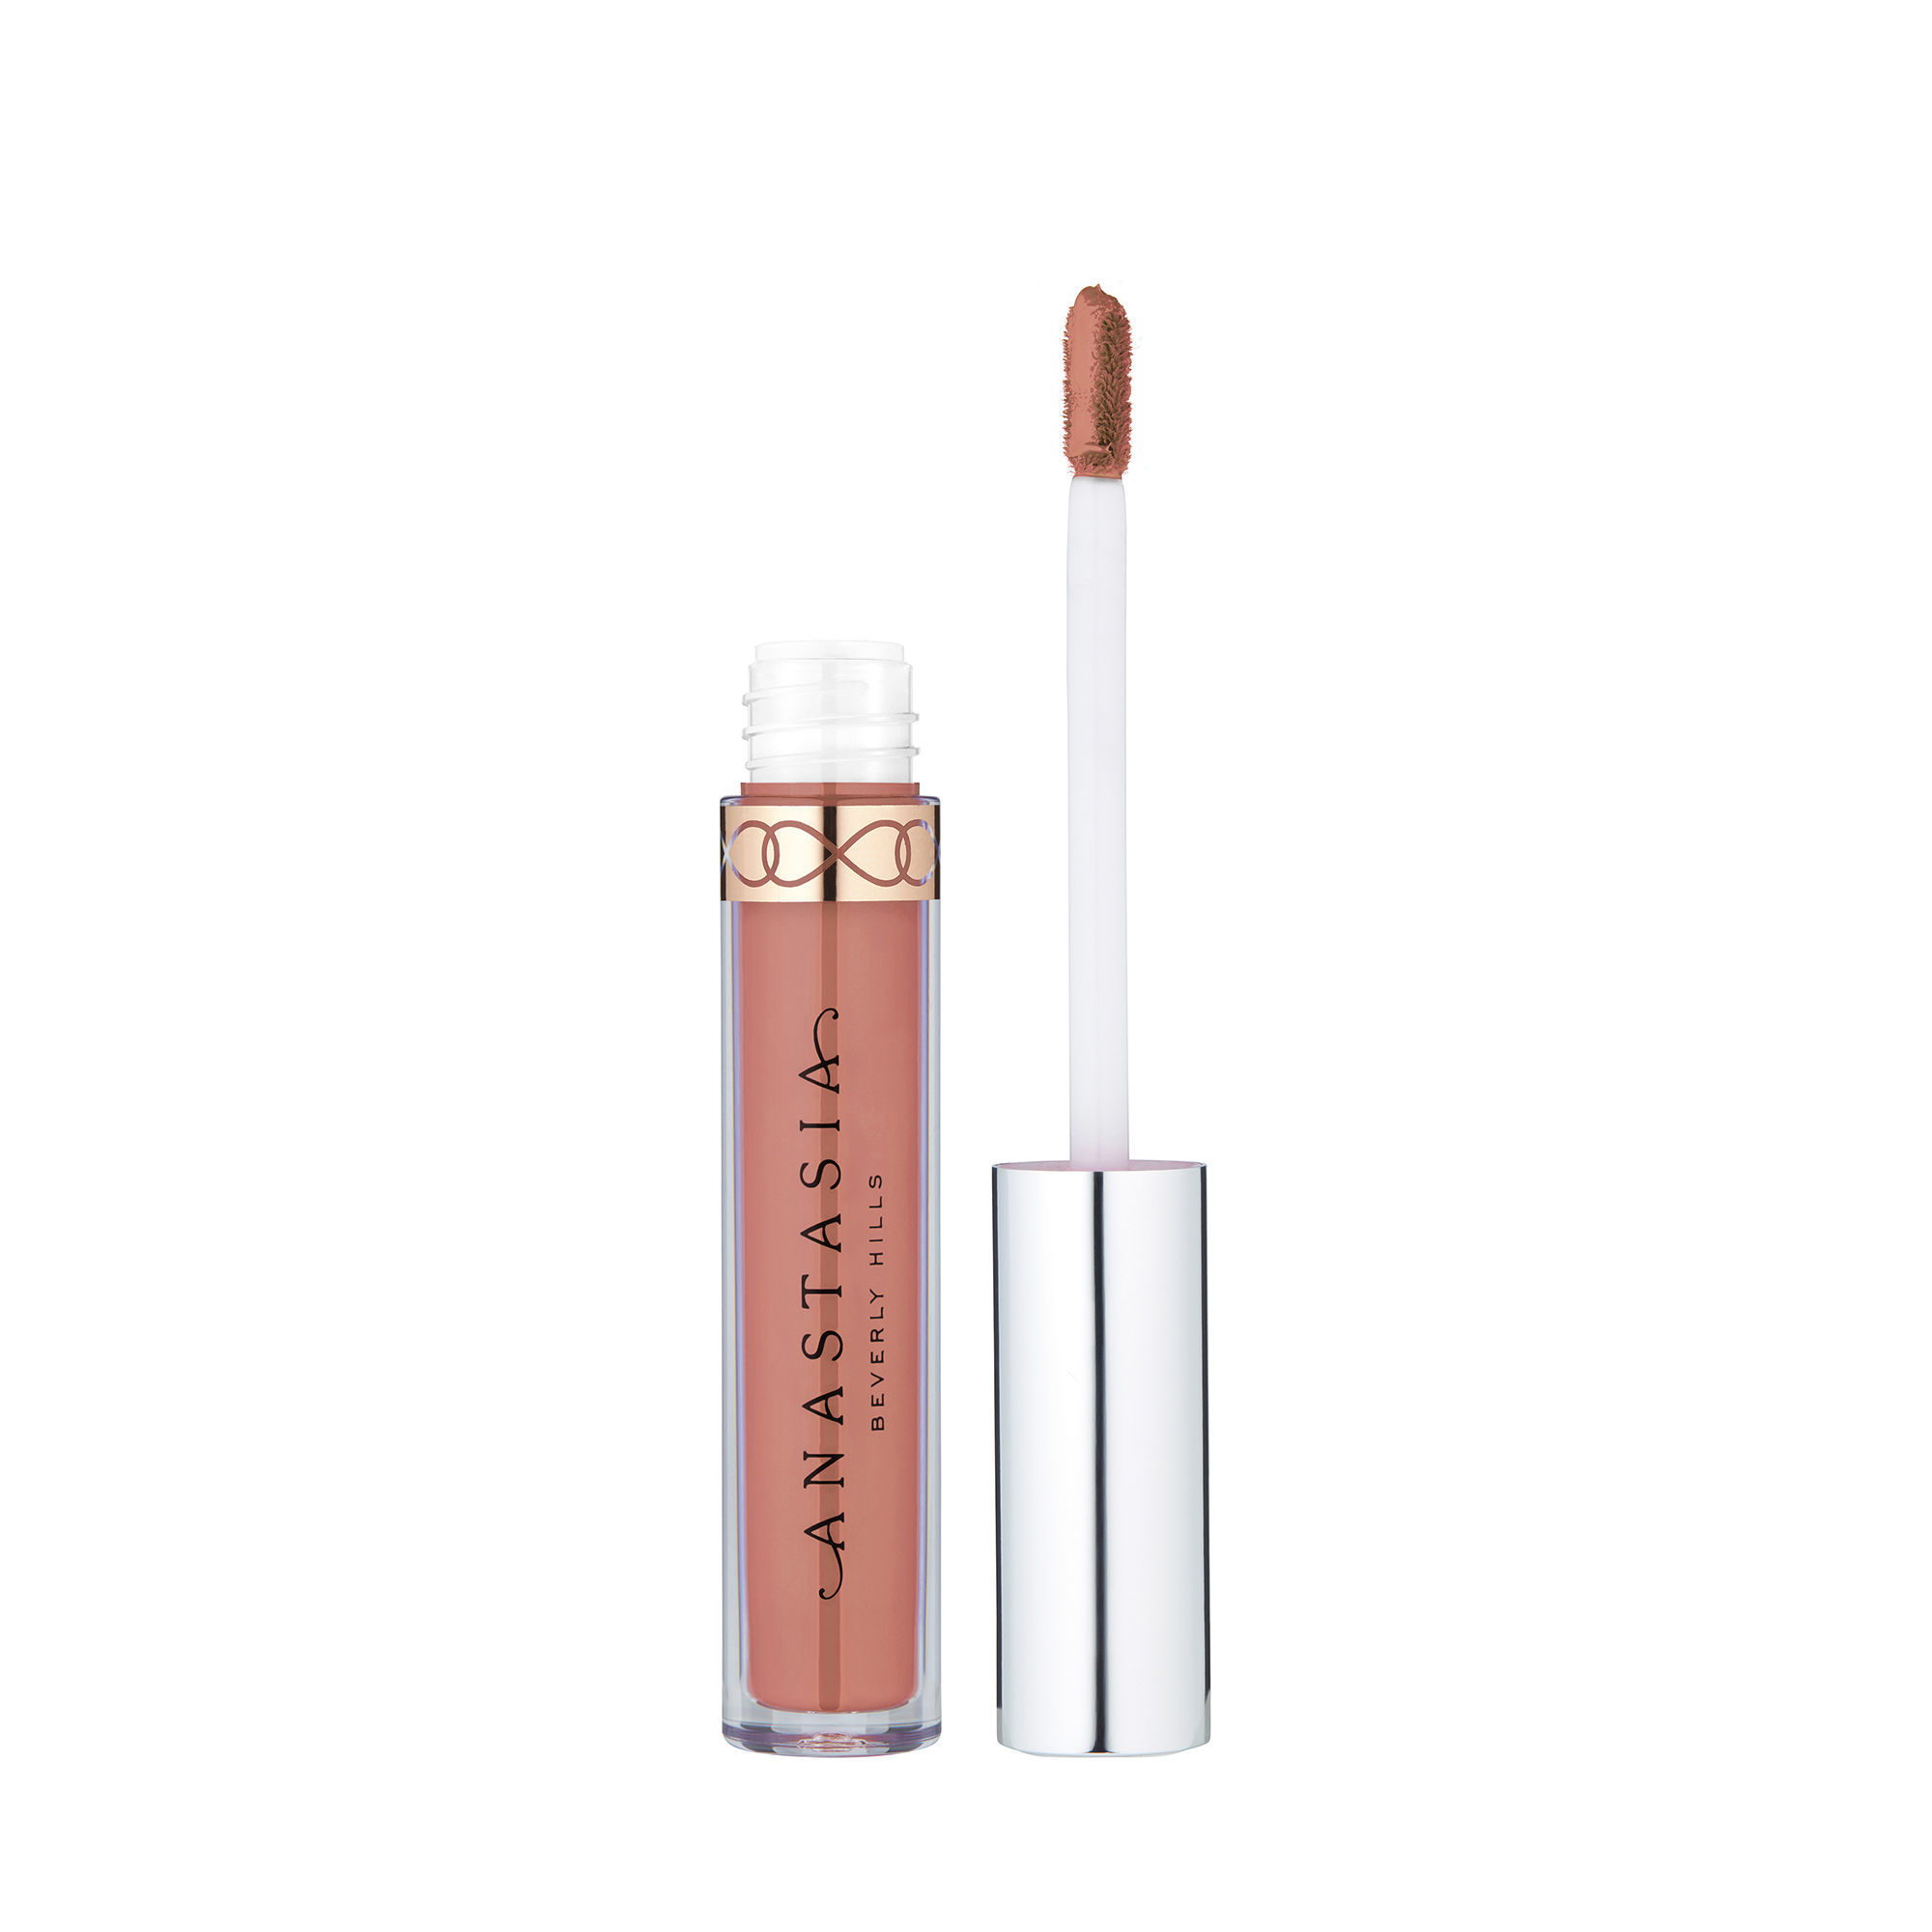 abh-dolce-liquid-lipstick-off